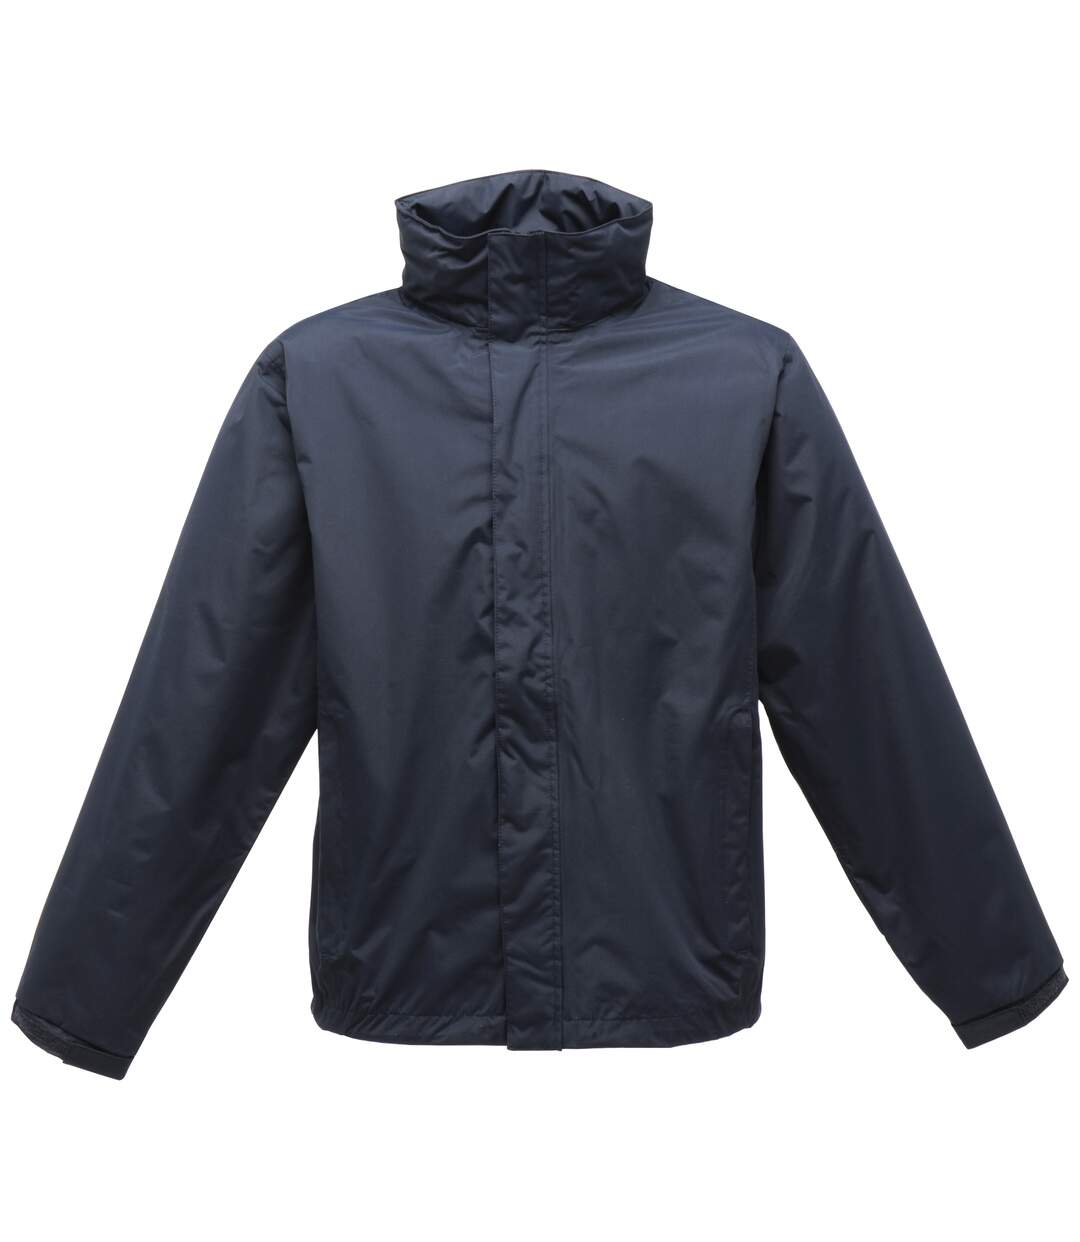 Regatta Mens Pace II Lightweight Waterproof Jacket (Navy/Navy) - UTBC1495